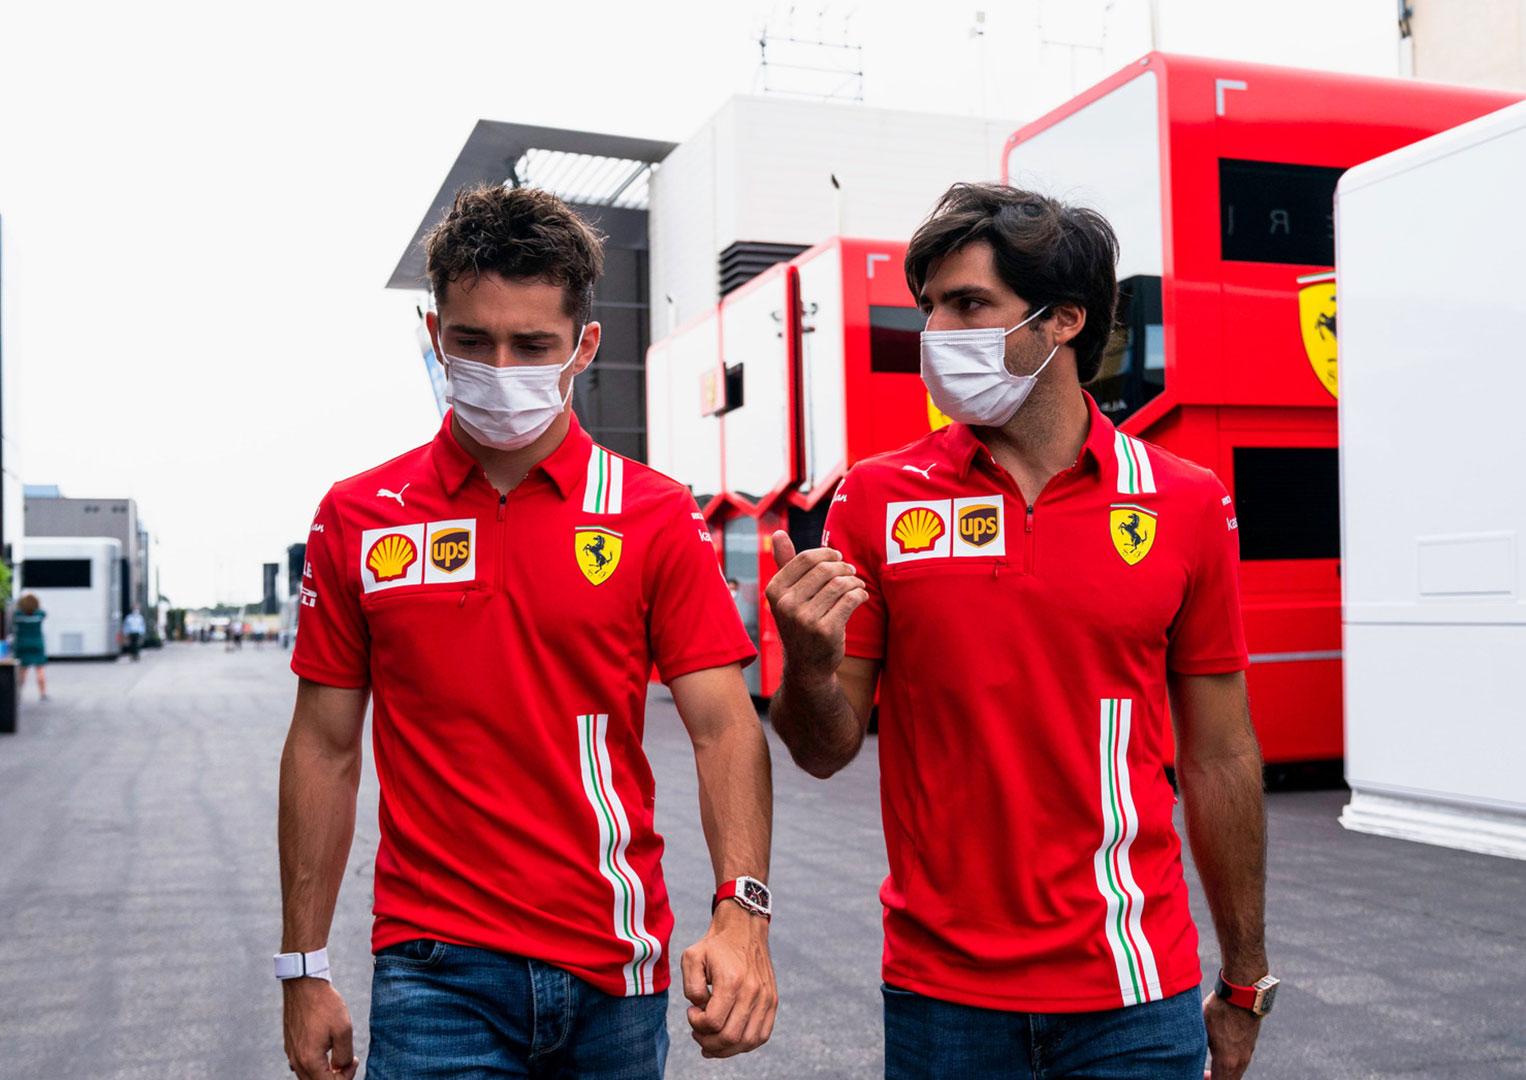 Ferrari drivers wearing Richard Mille watches